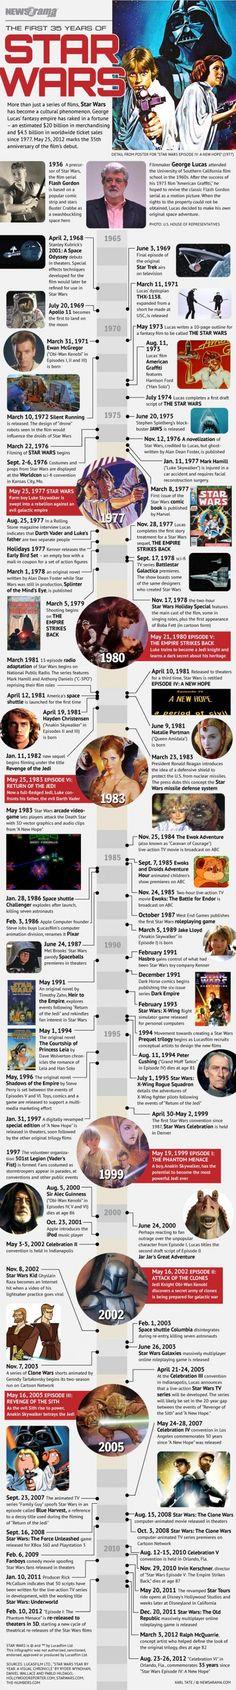 35 Years of Star Wars